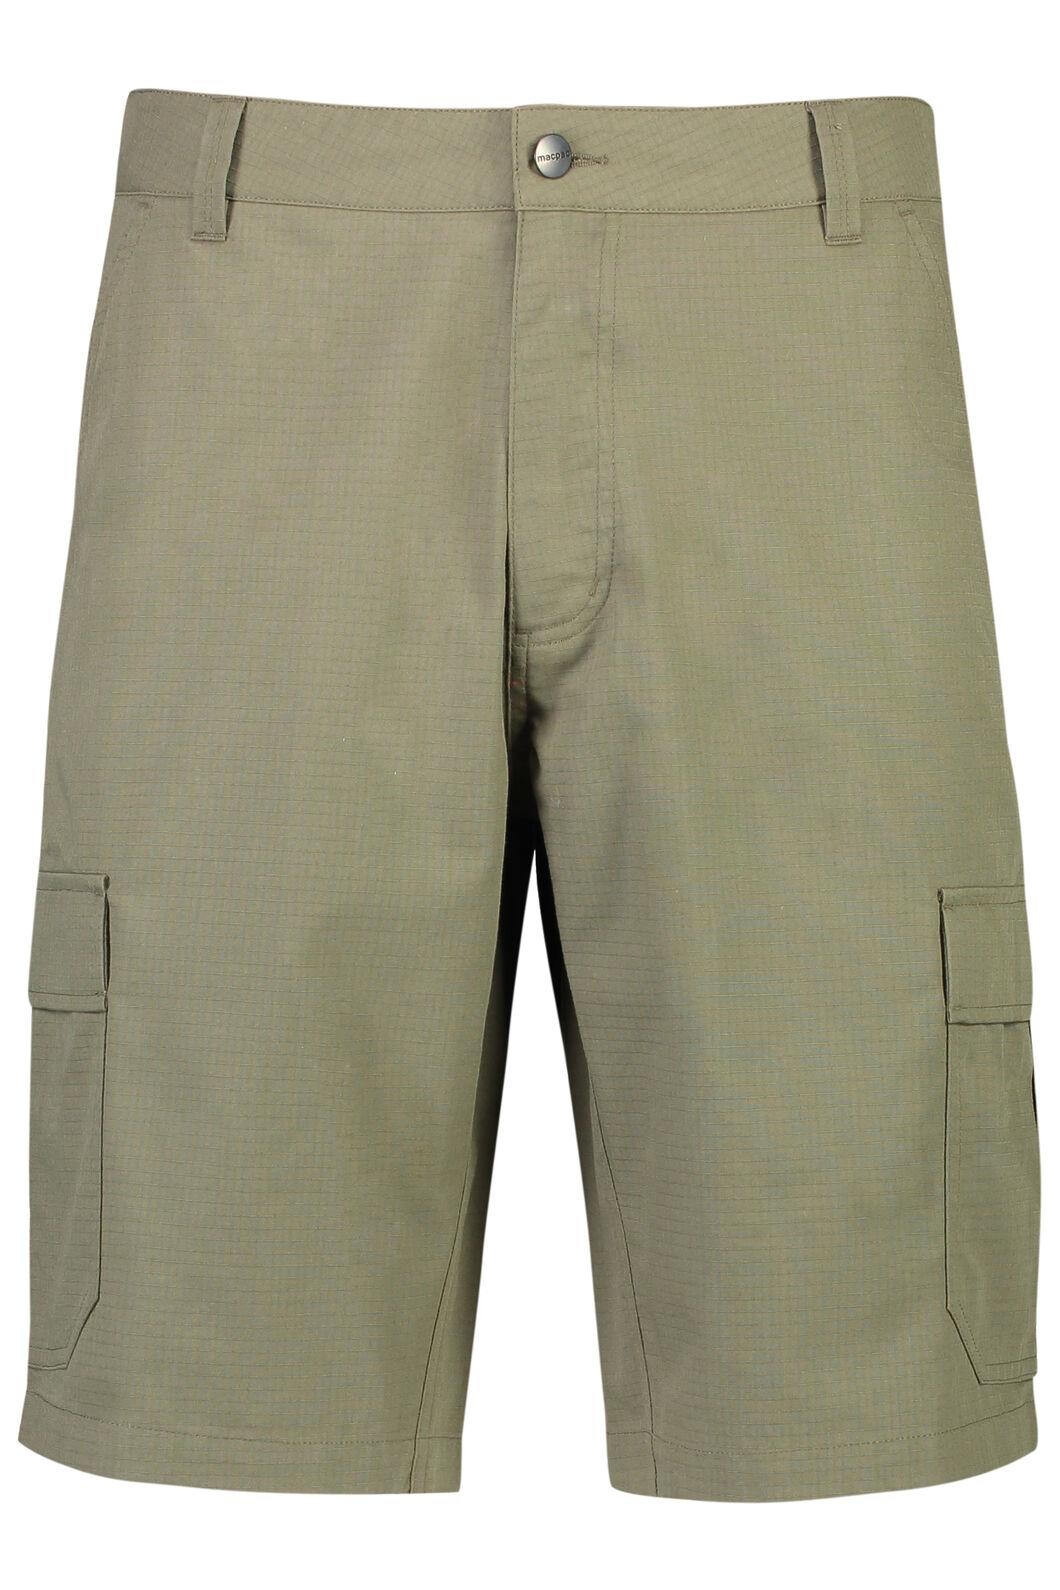 Macpac Onsight Cargo Shorts - Men's, Grape Leaf, hi-res